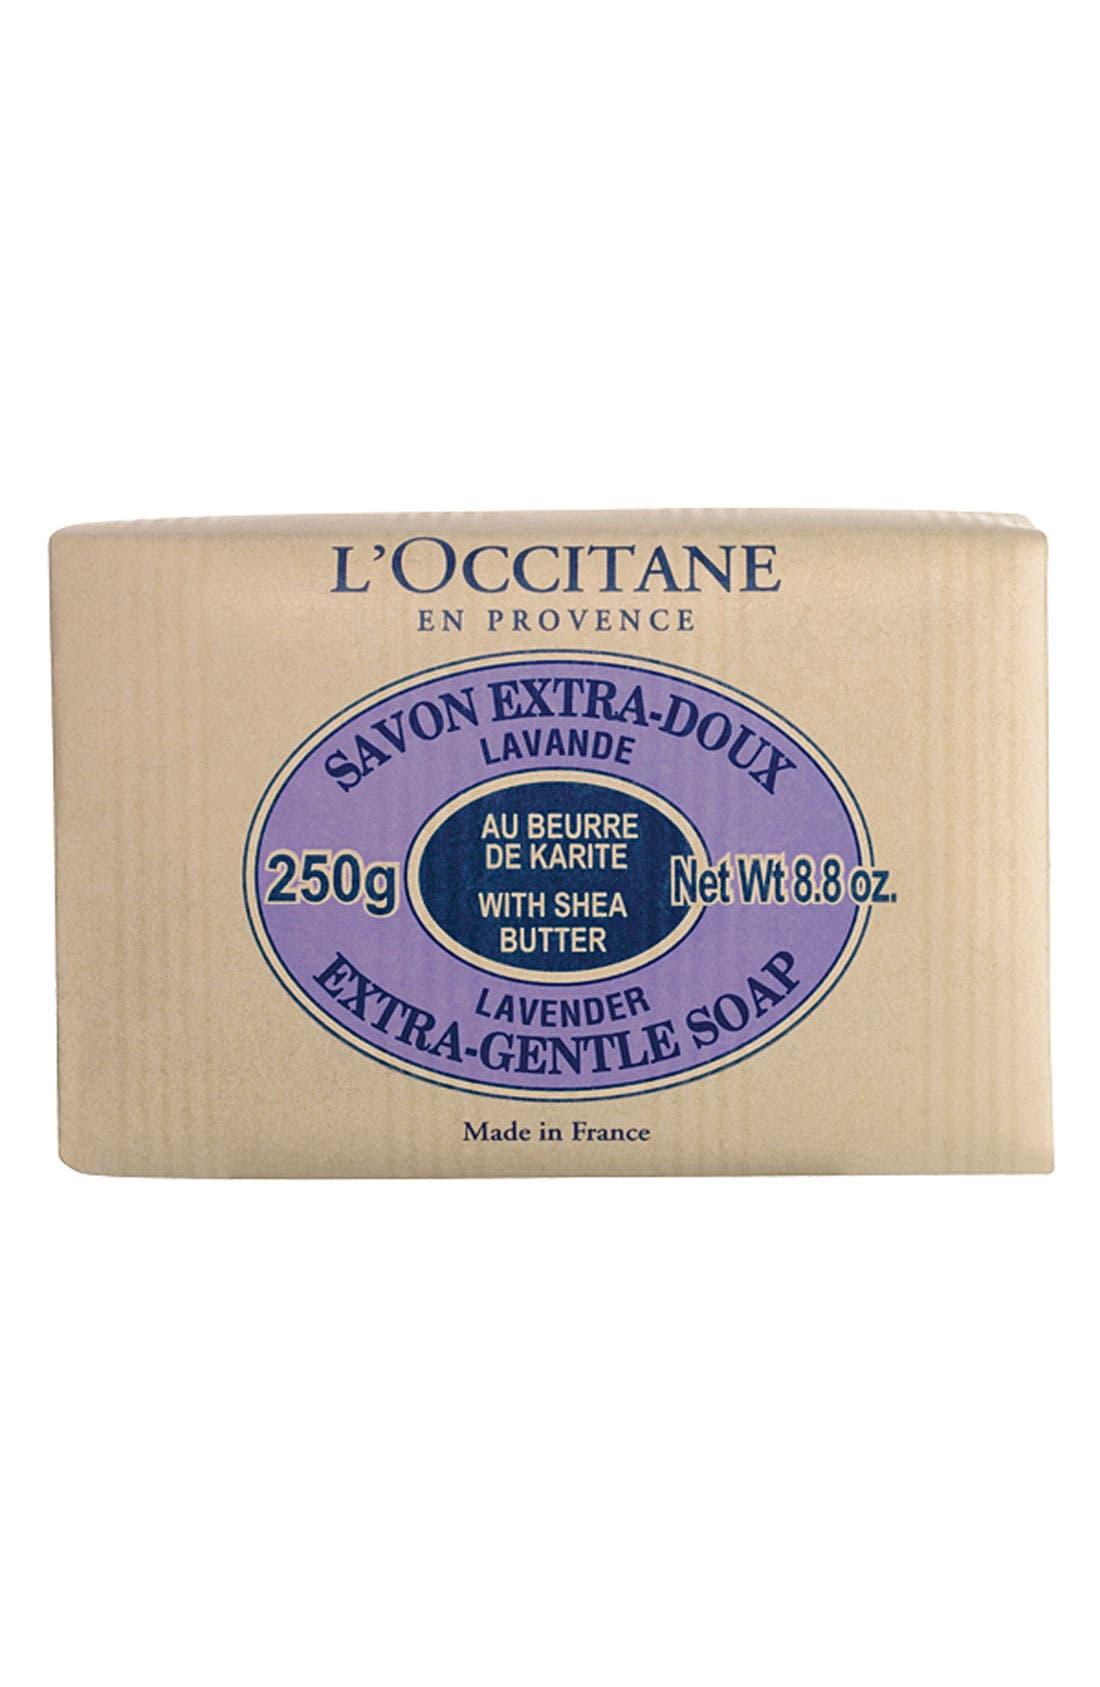 L'Occitane 'Lavender' Shea Butter Extra Gentle Soap